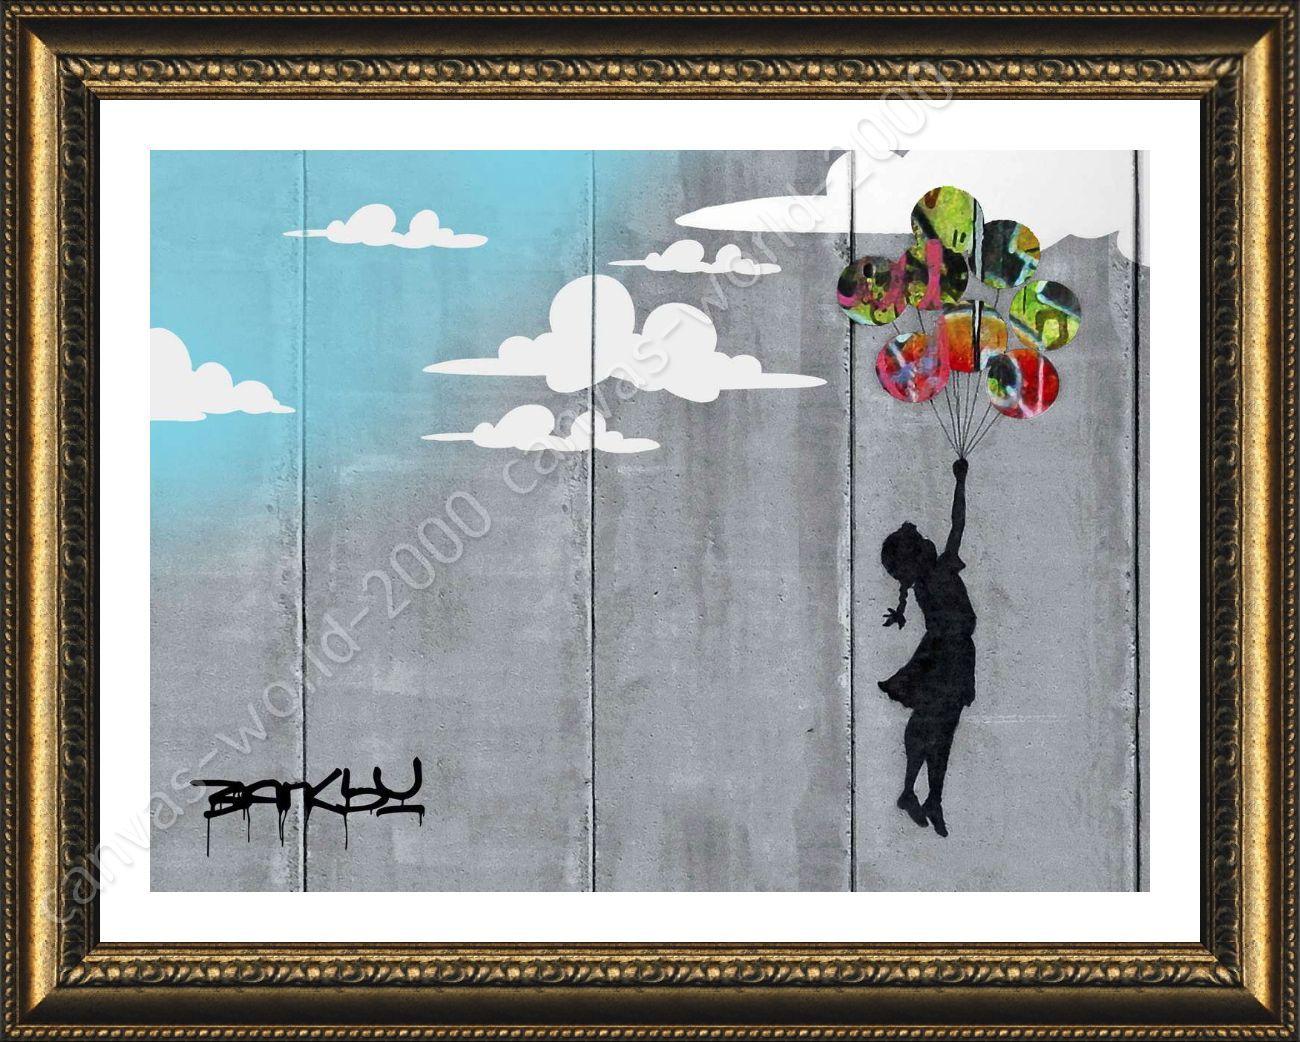 Urban Graffiti Banksy Collage Wall Art Canvas Print Picture Ready To Hang Ebay